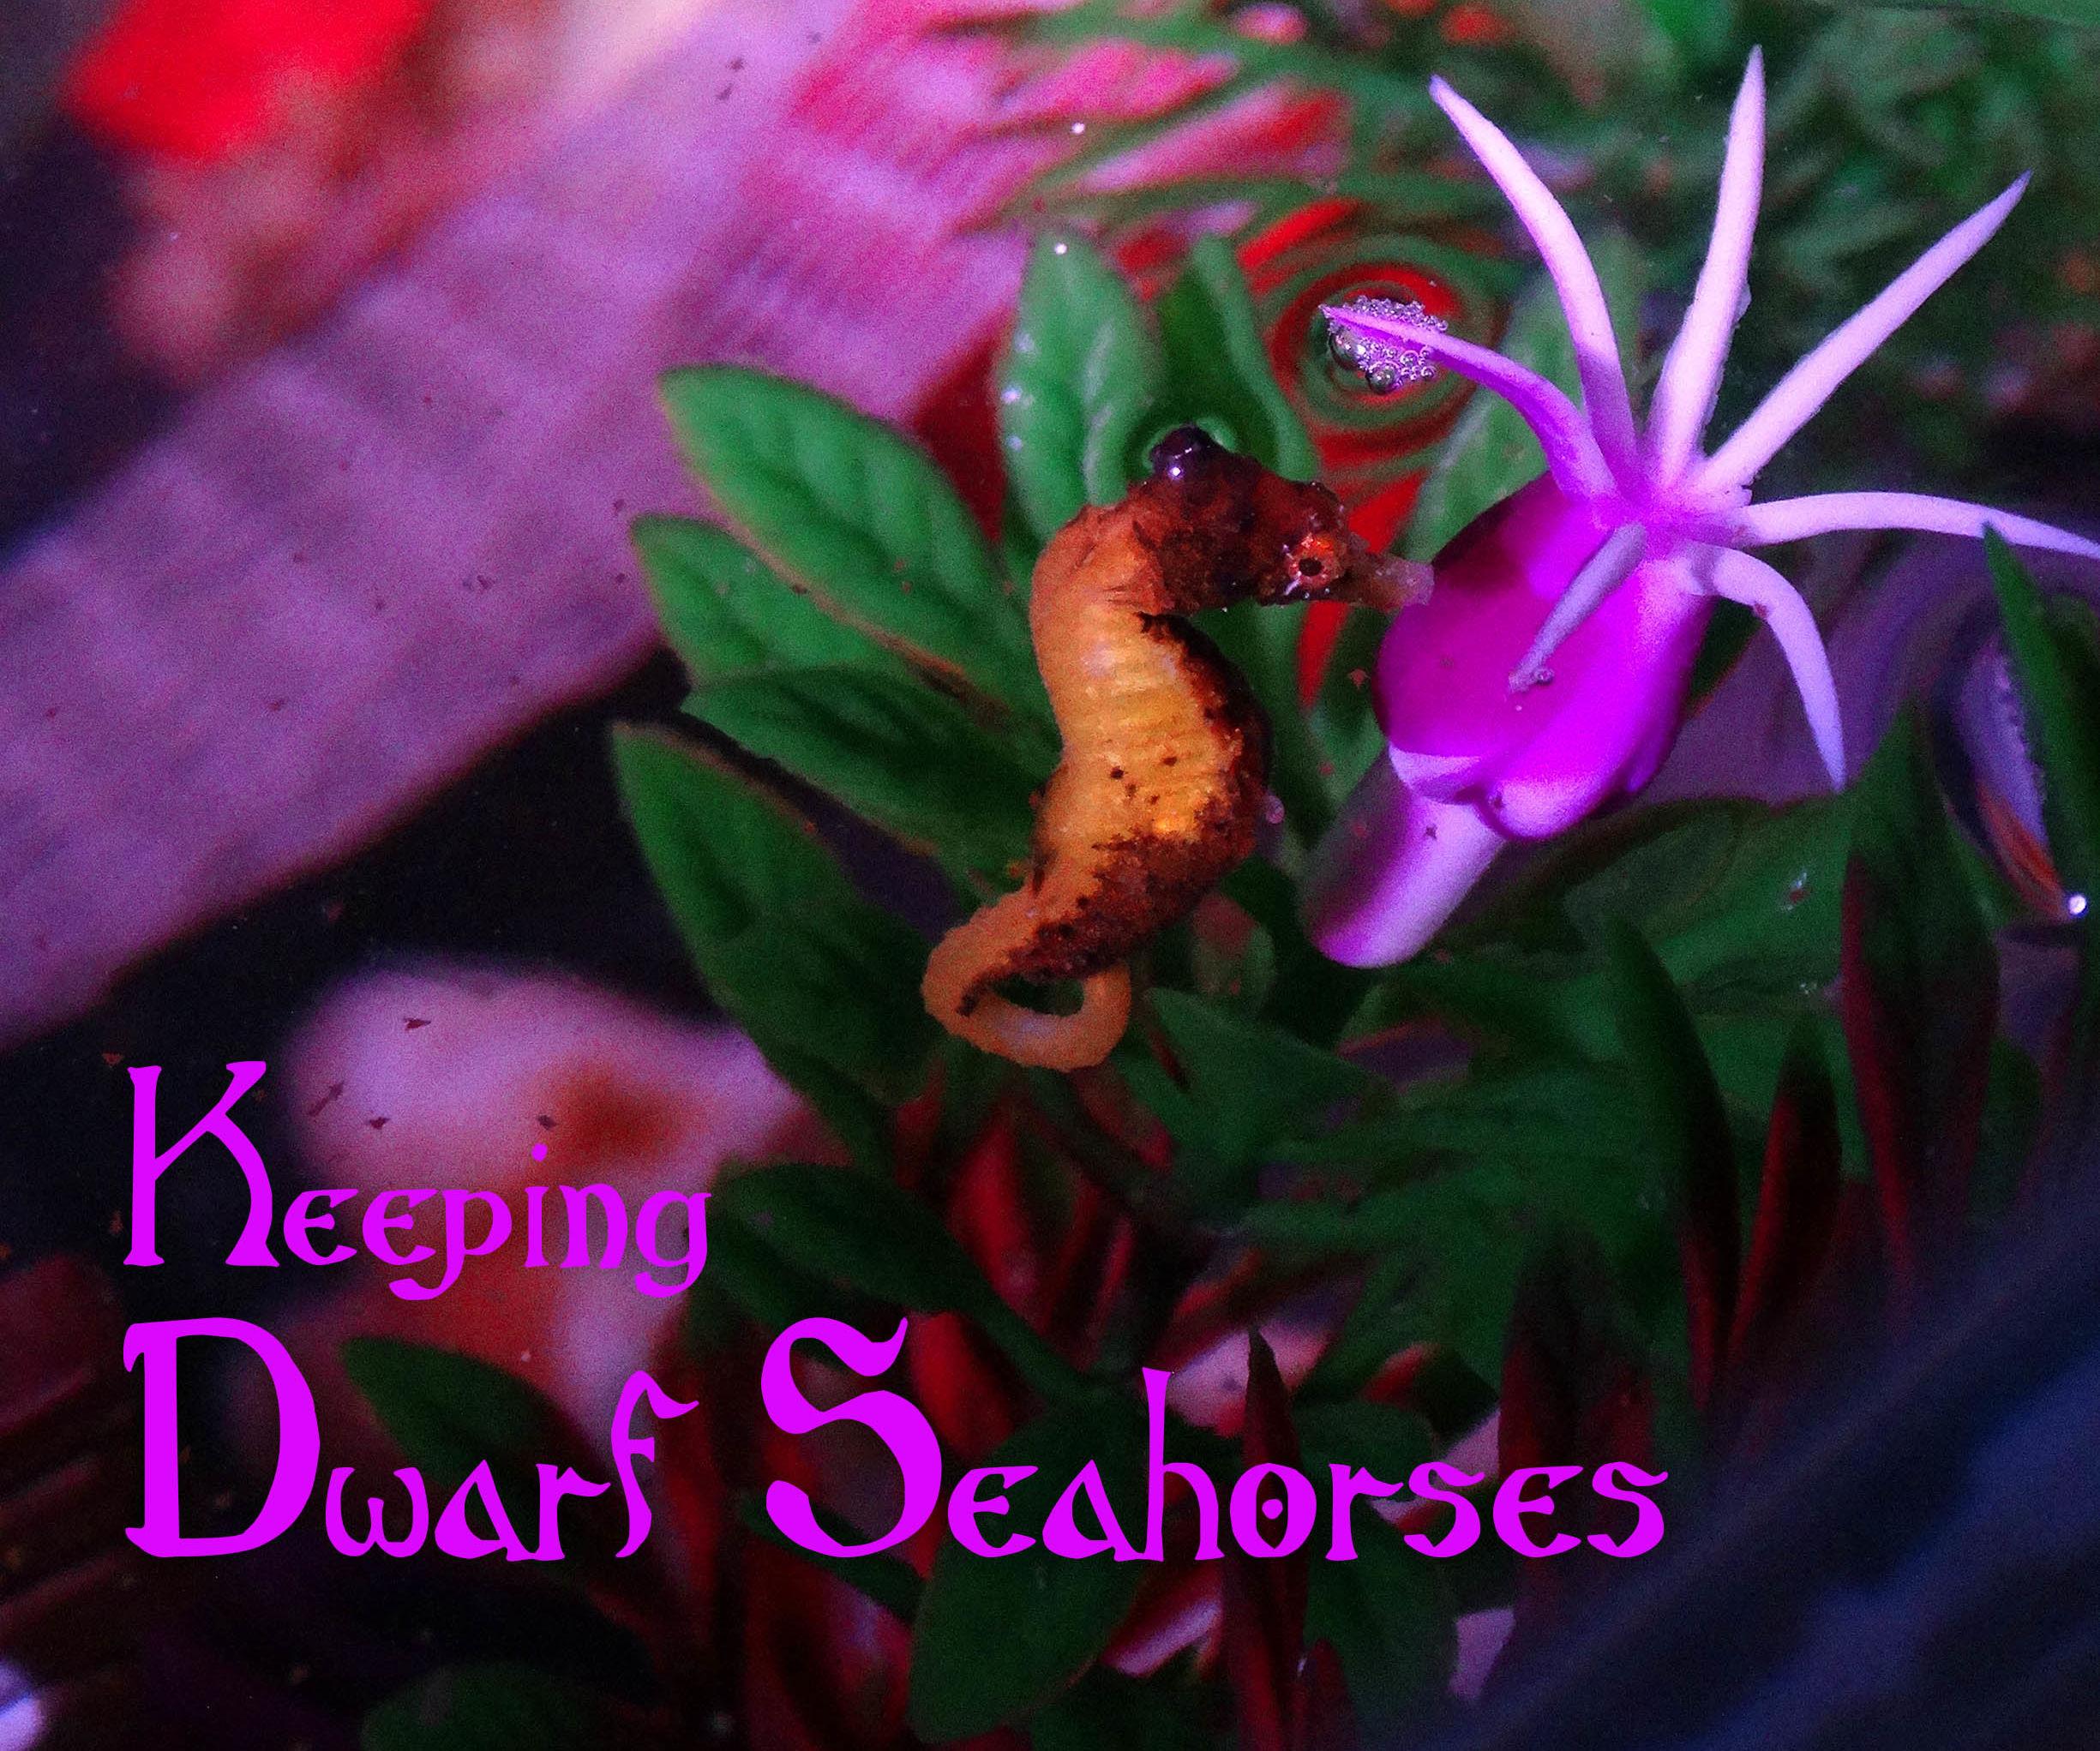 Keeping Dwarf Seahorses